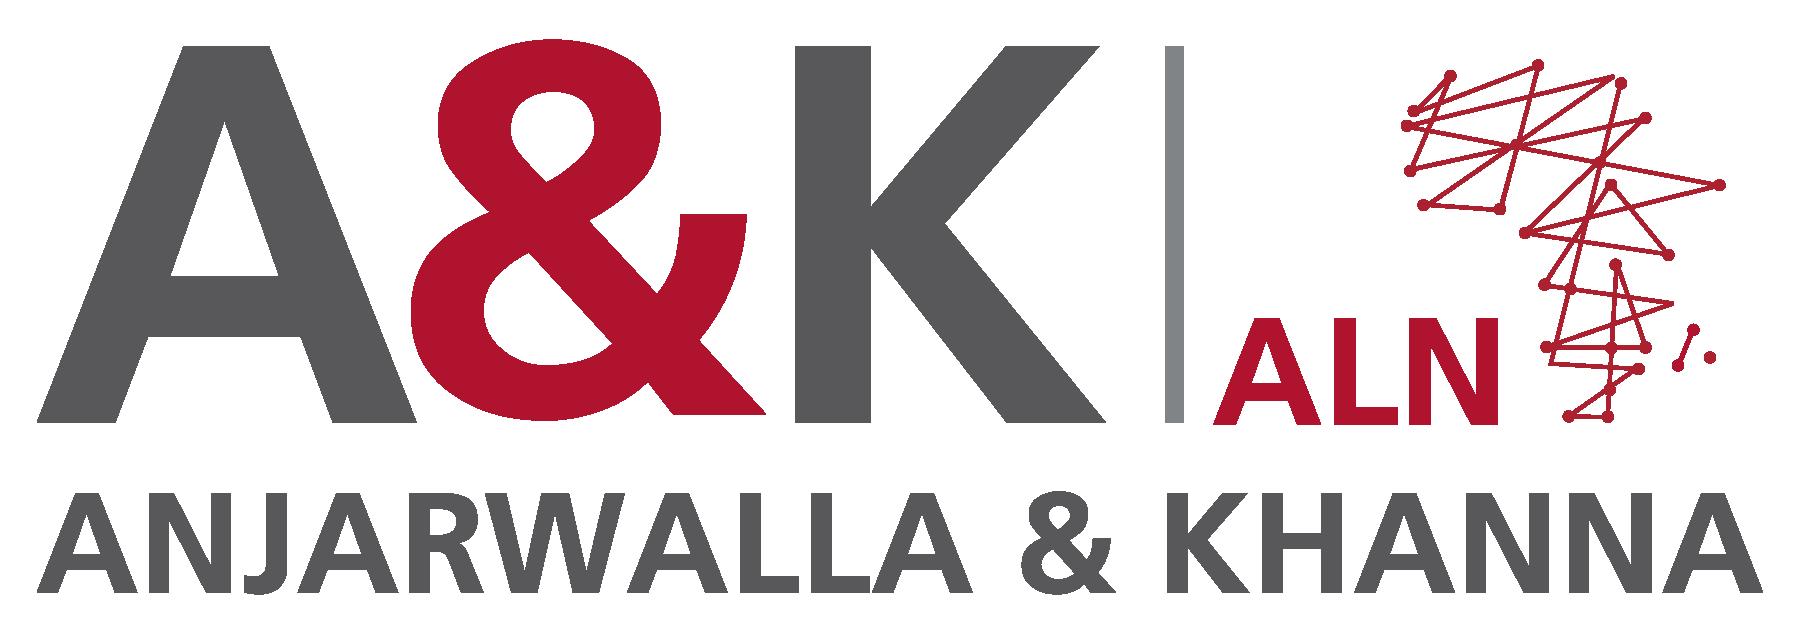 A&K 2017 Logo Coloured.png